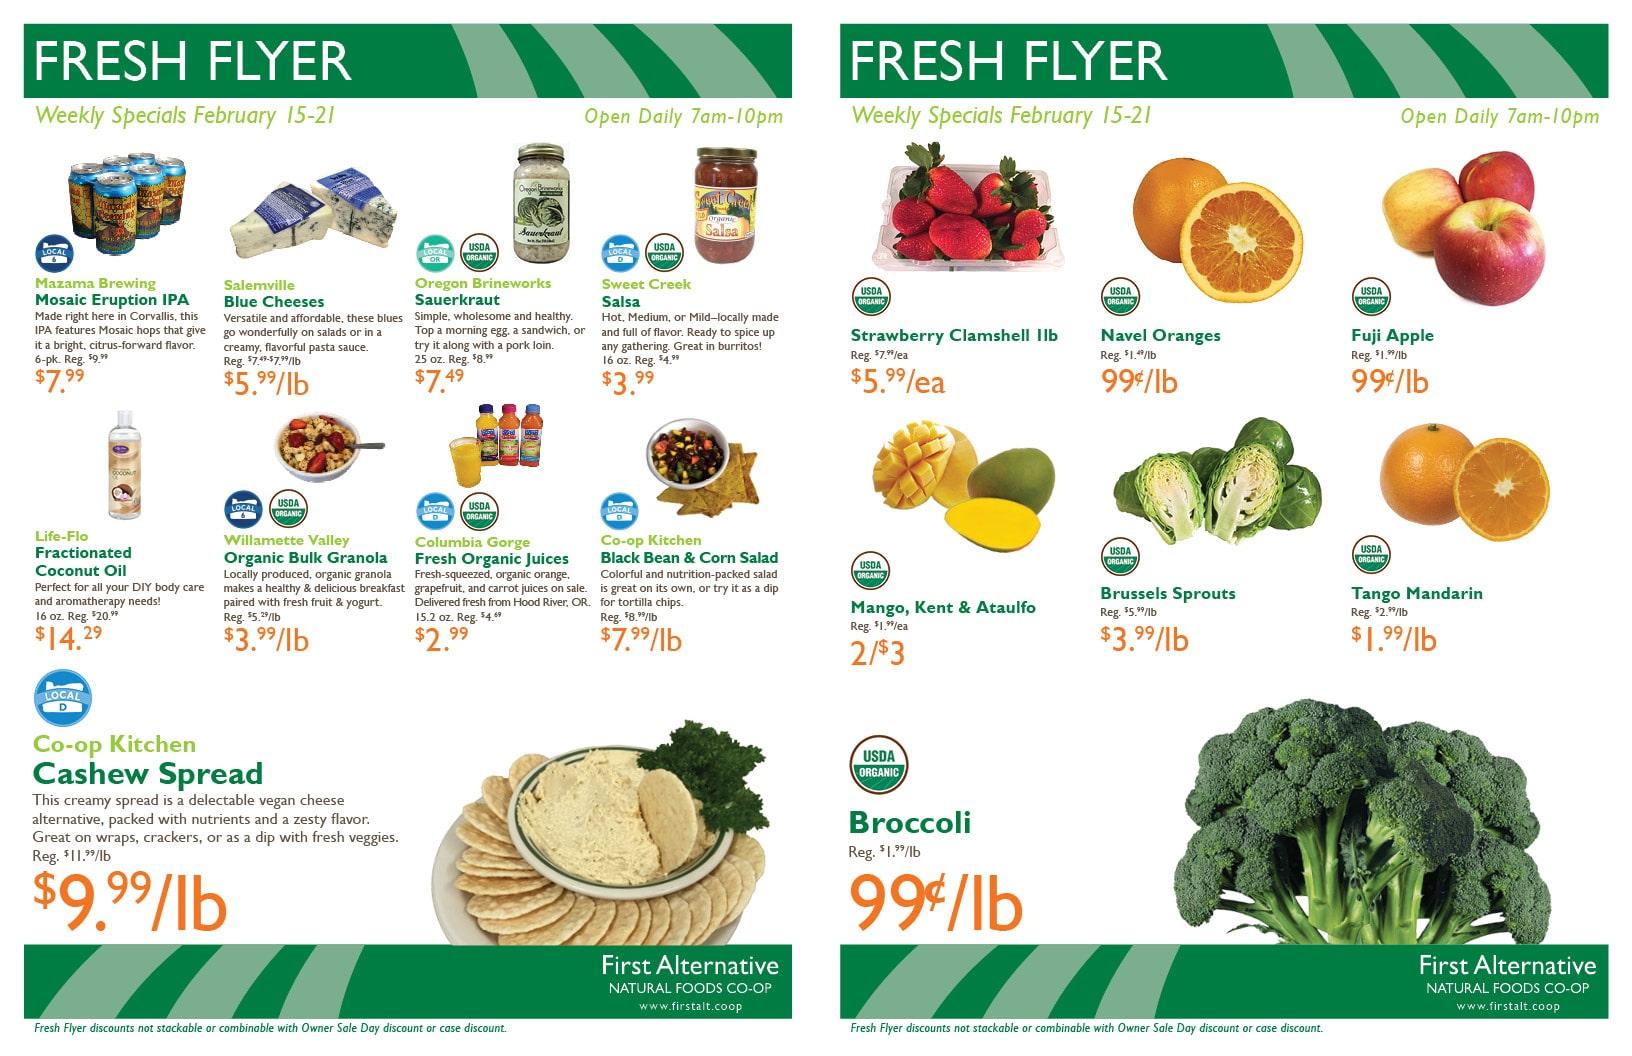 First Alternative Co-op Fresh Flyer Feb. 15-21